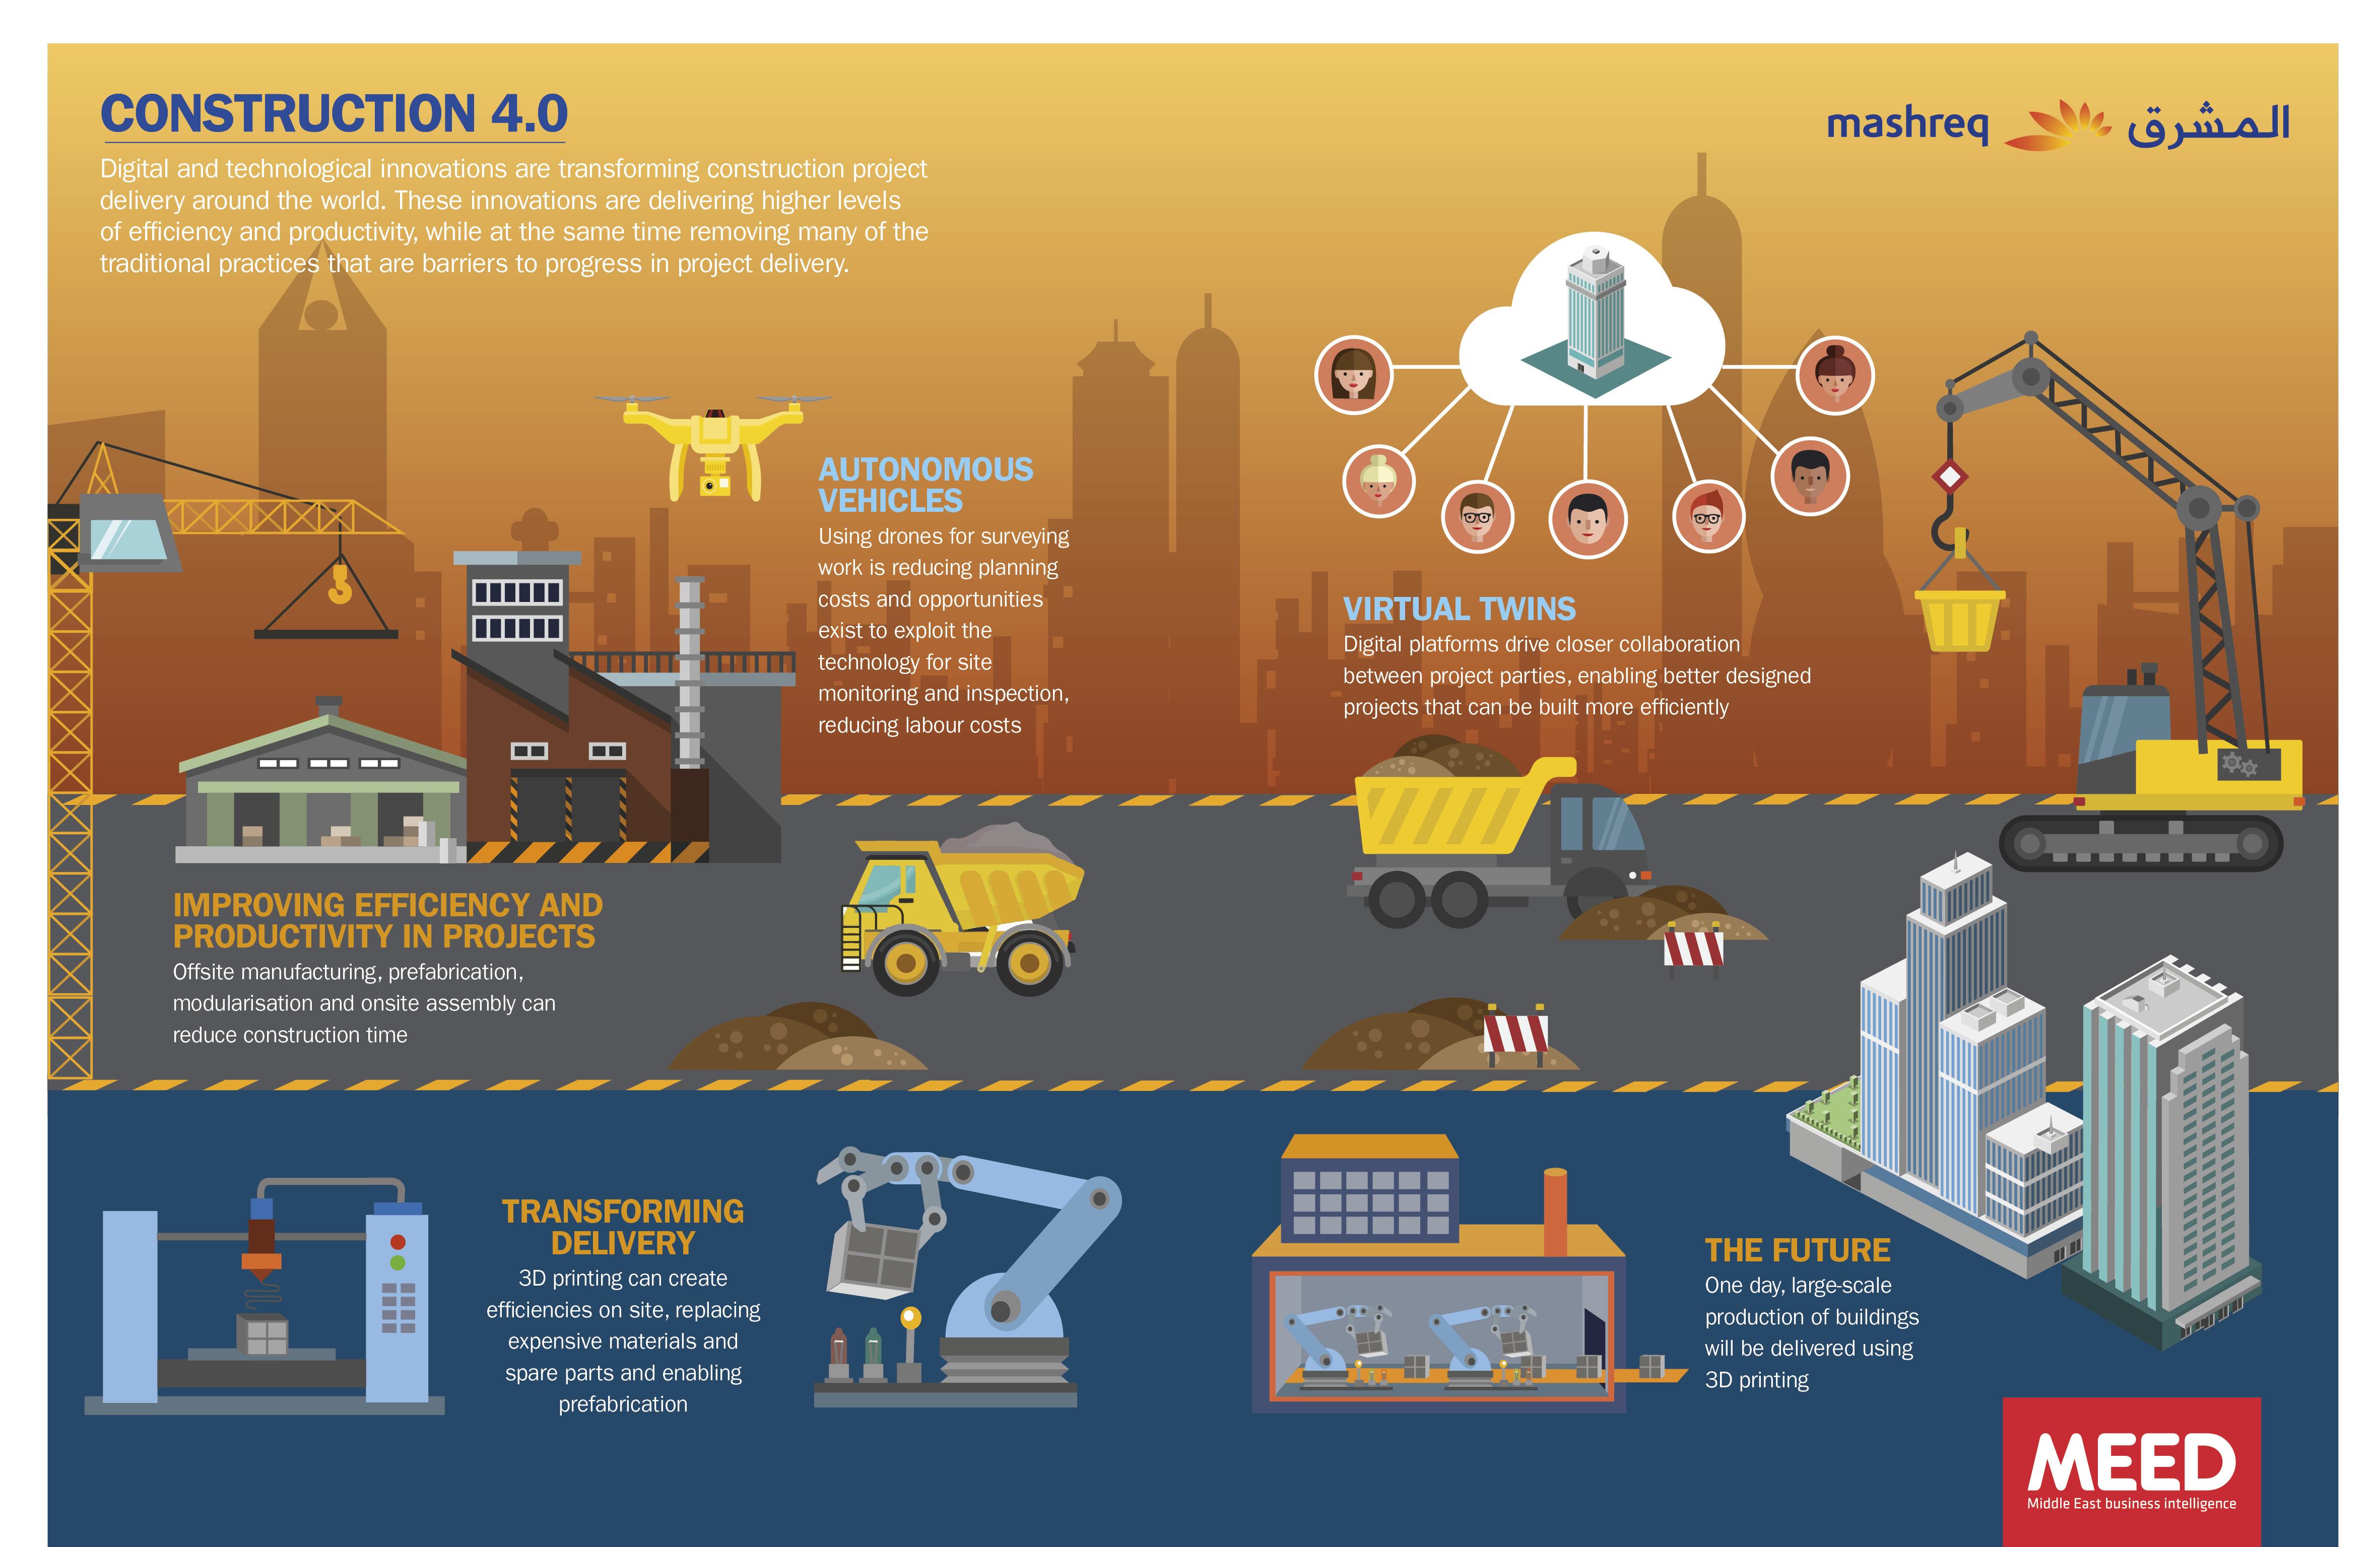 Construction 4 0 - Meed Mashreq INDUSTRY INSIGHT